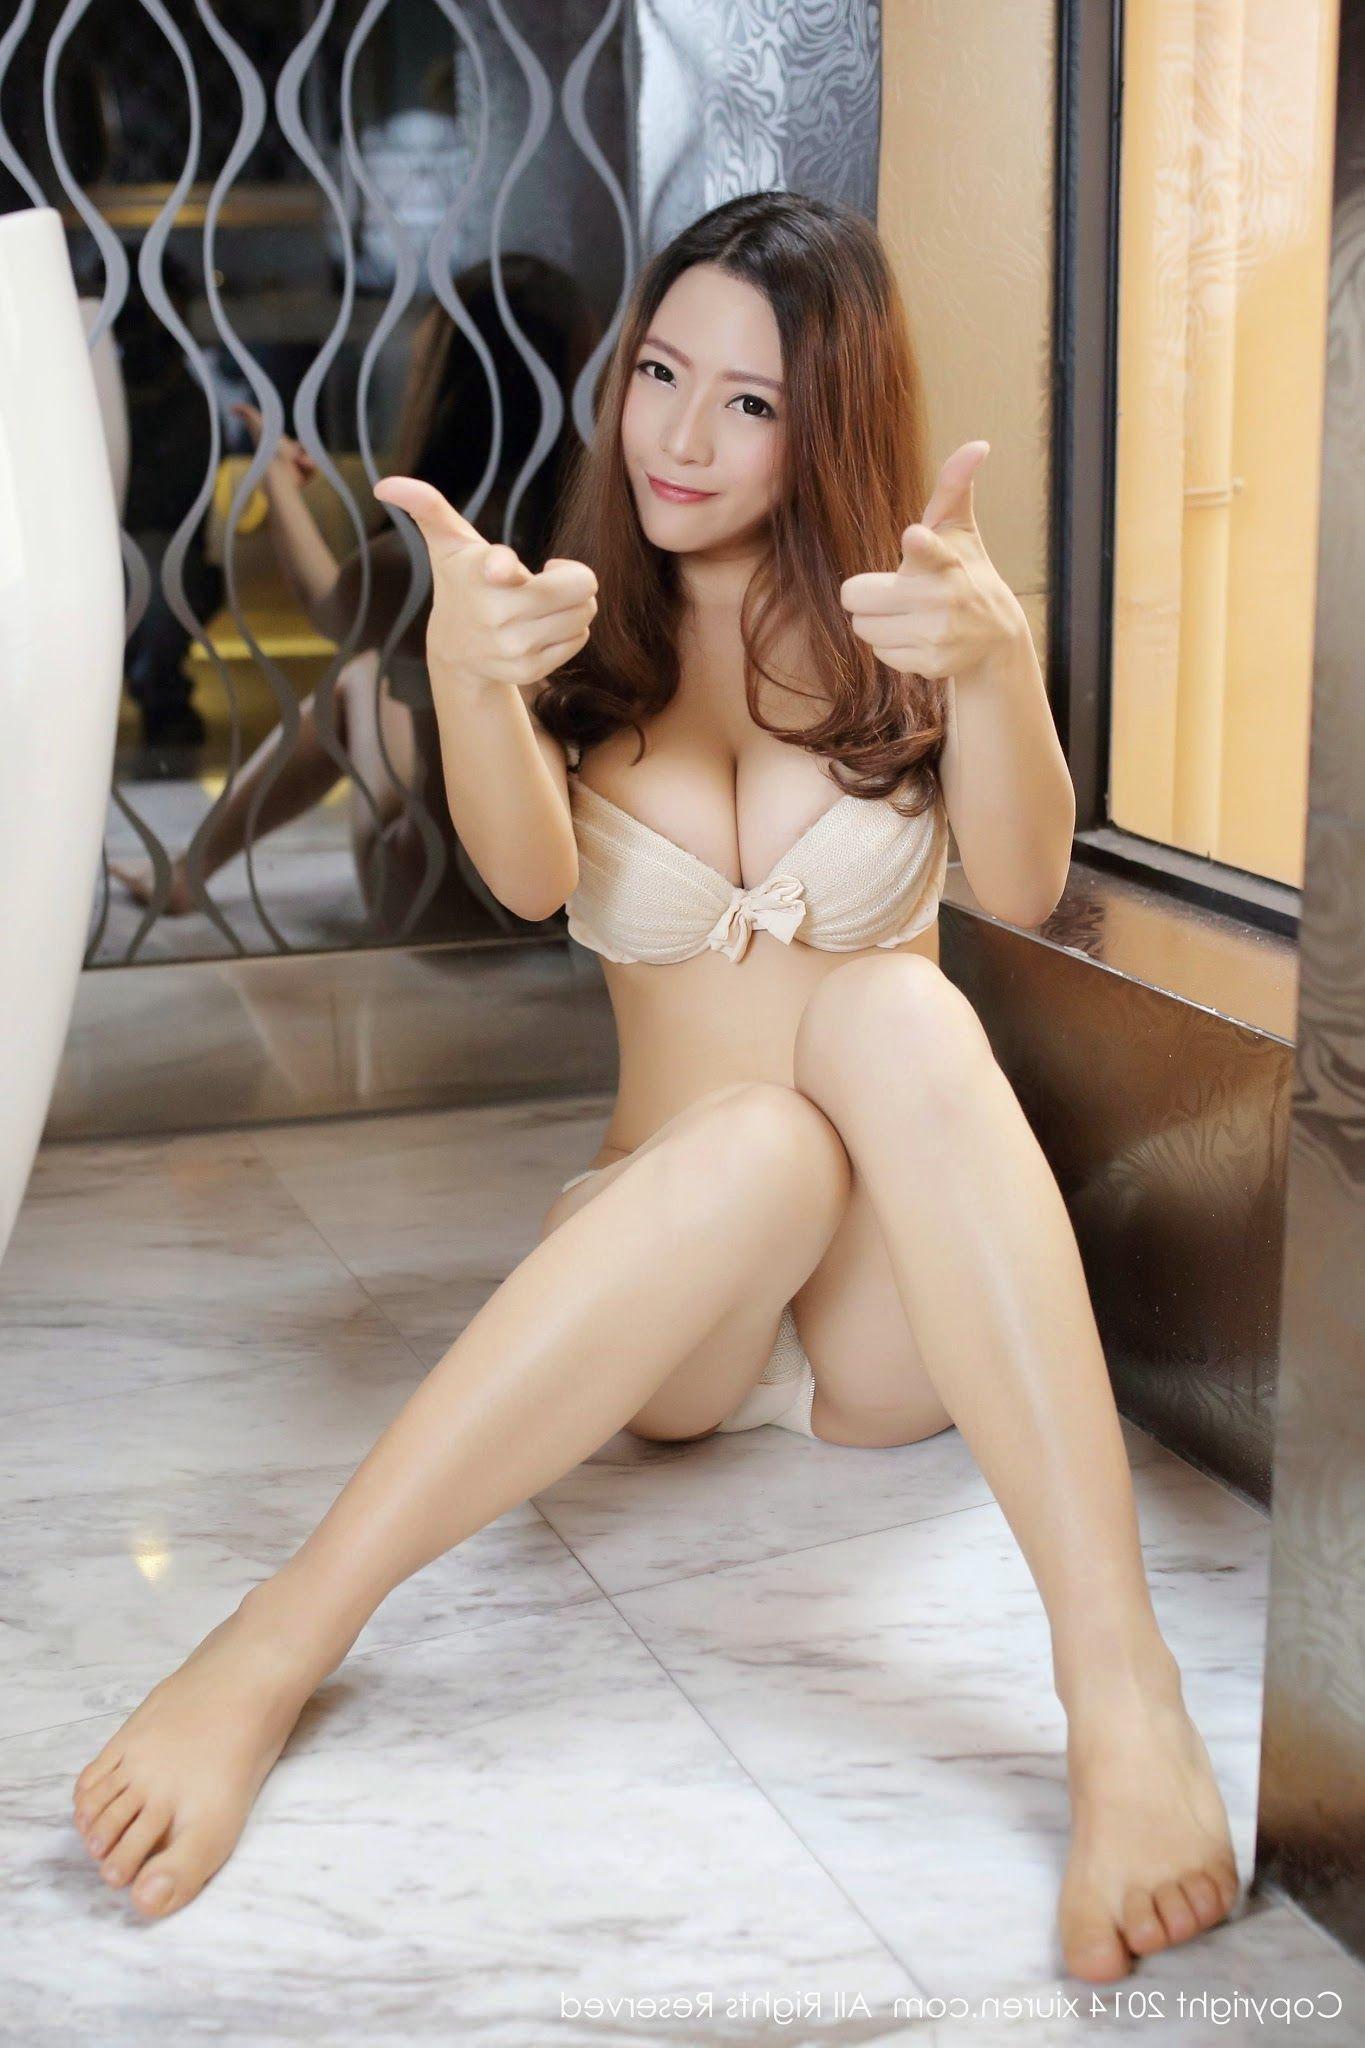 sexy women naked bathroom pics